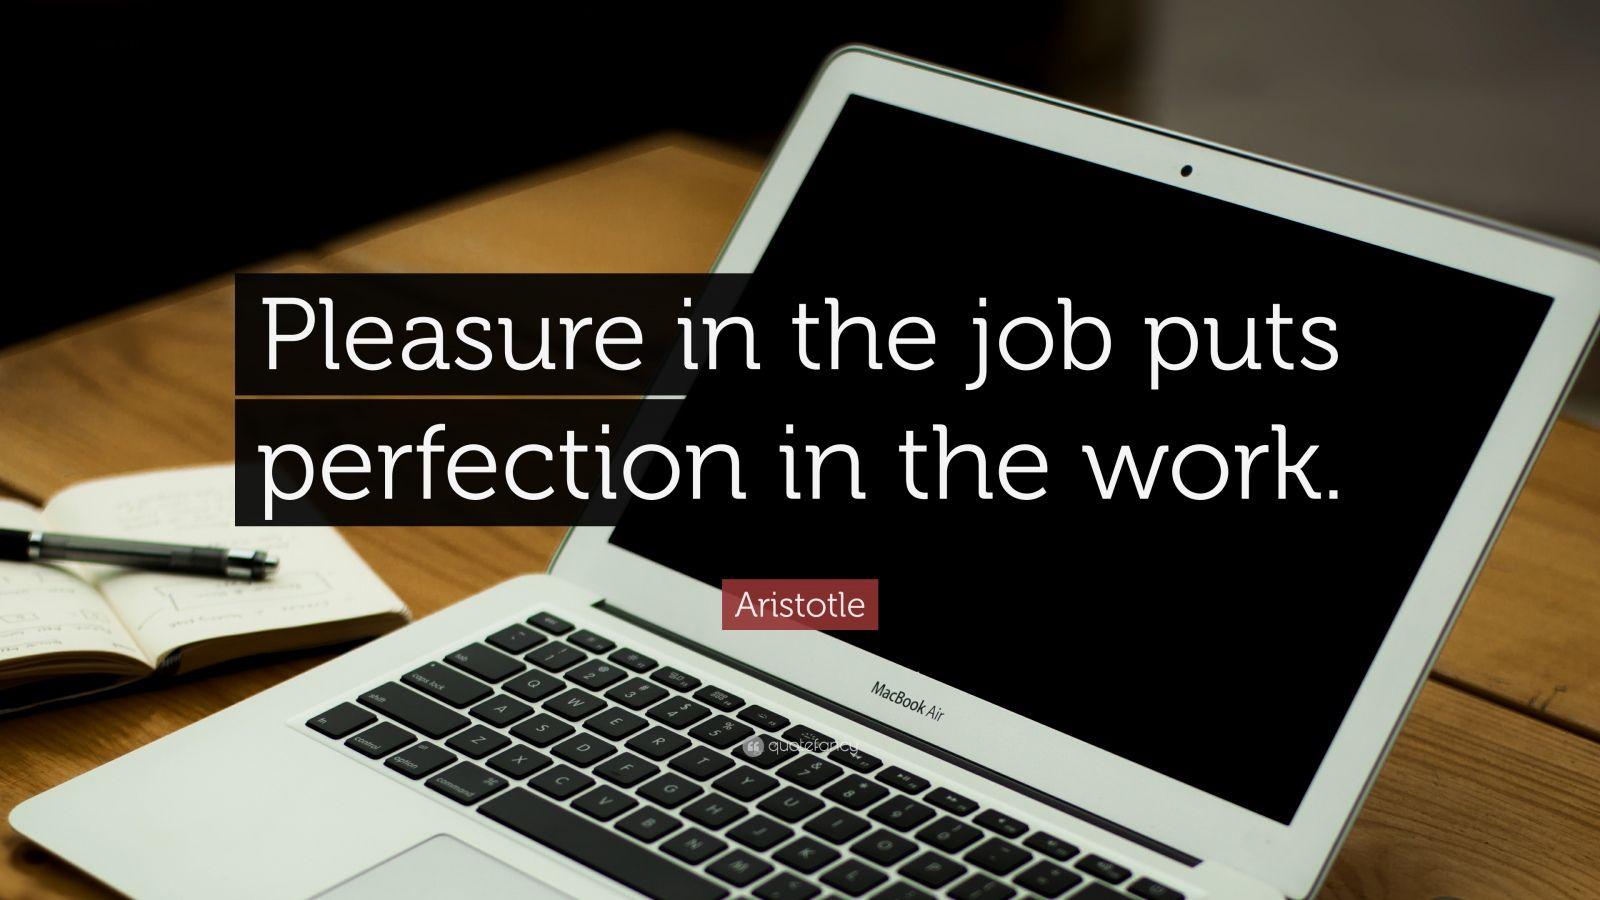 Success Quotes Desktop Wallpaper Aristotle Quote Pleasure In The Job Puts Perfection In